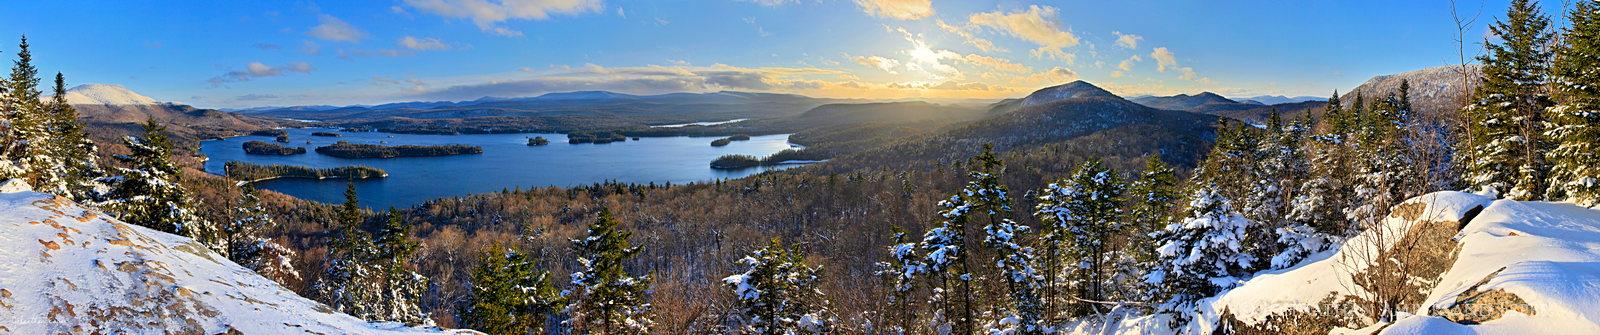 Blue Mountain Lake,Blue Mountain,Castle Rock,winter,panorama,December,Adirondack Park,Adirondacks,Johnathan Esper, photo